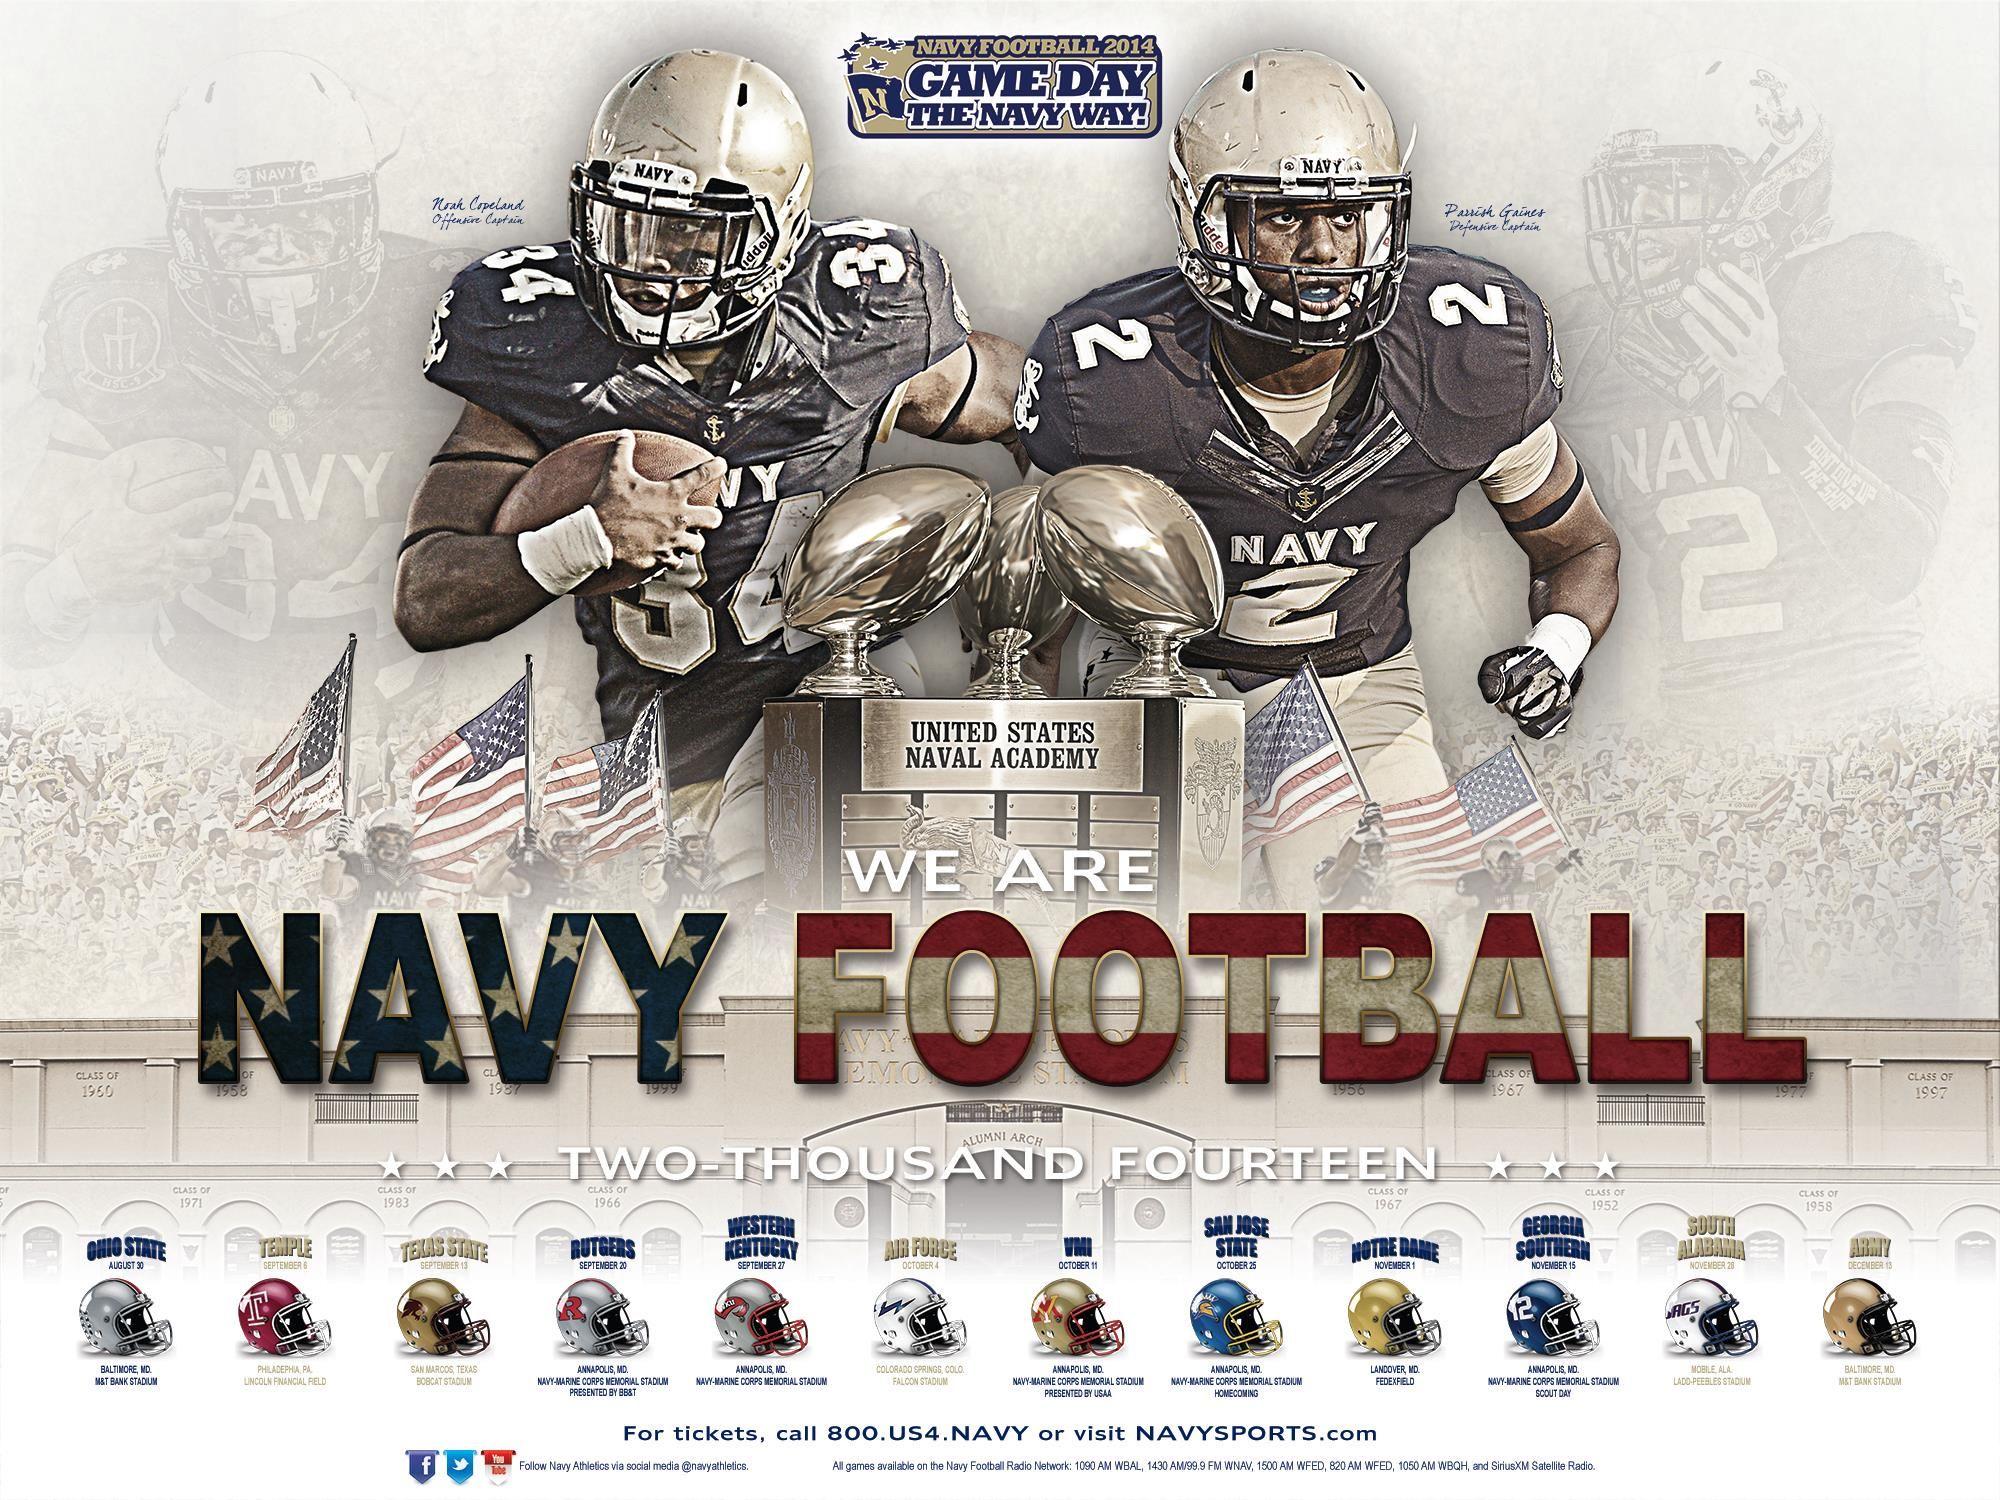 2014 College Football Schedule Poster Gallery Navy Football Army Football College Football Schedule